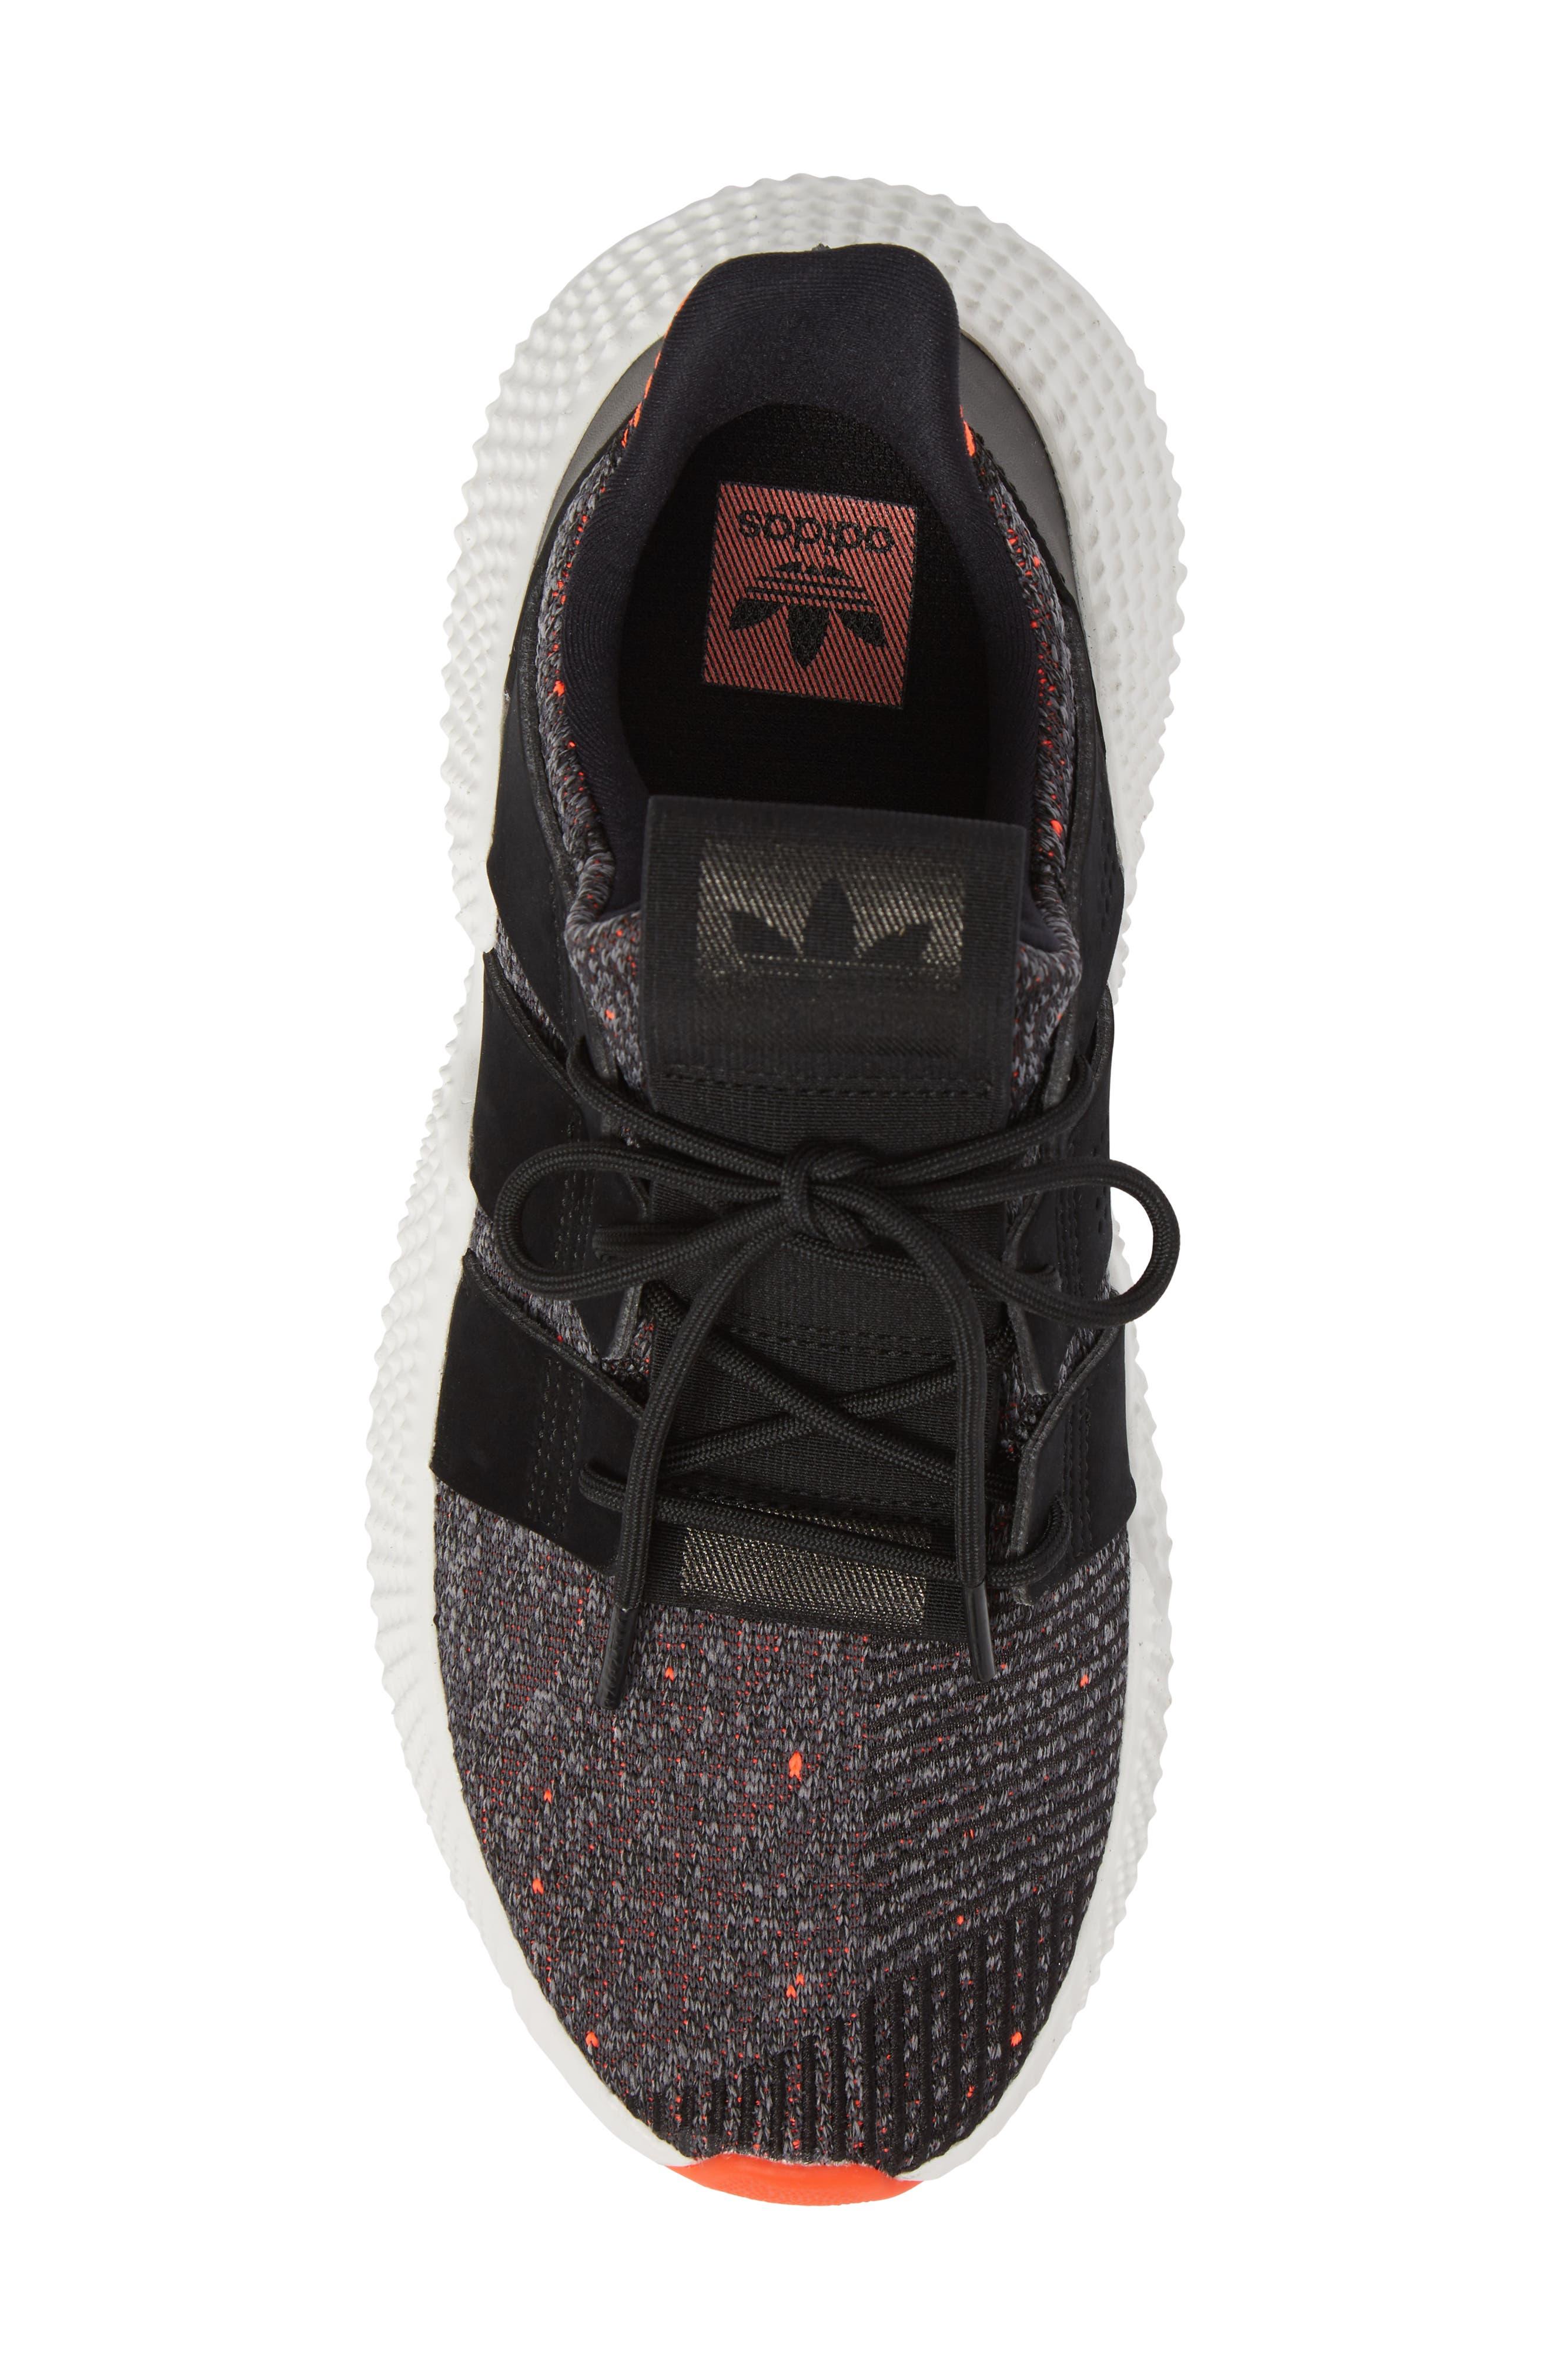 Prophere Sneaker,                             Alternate thumbnail 5, color,                             Black/ Solar Red